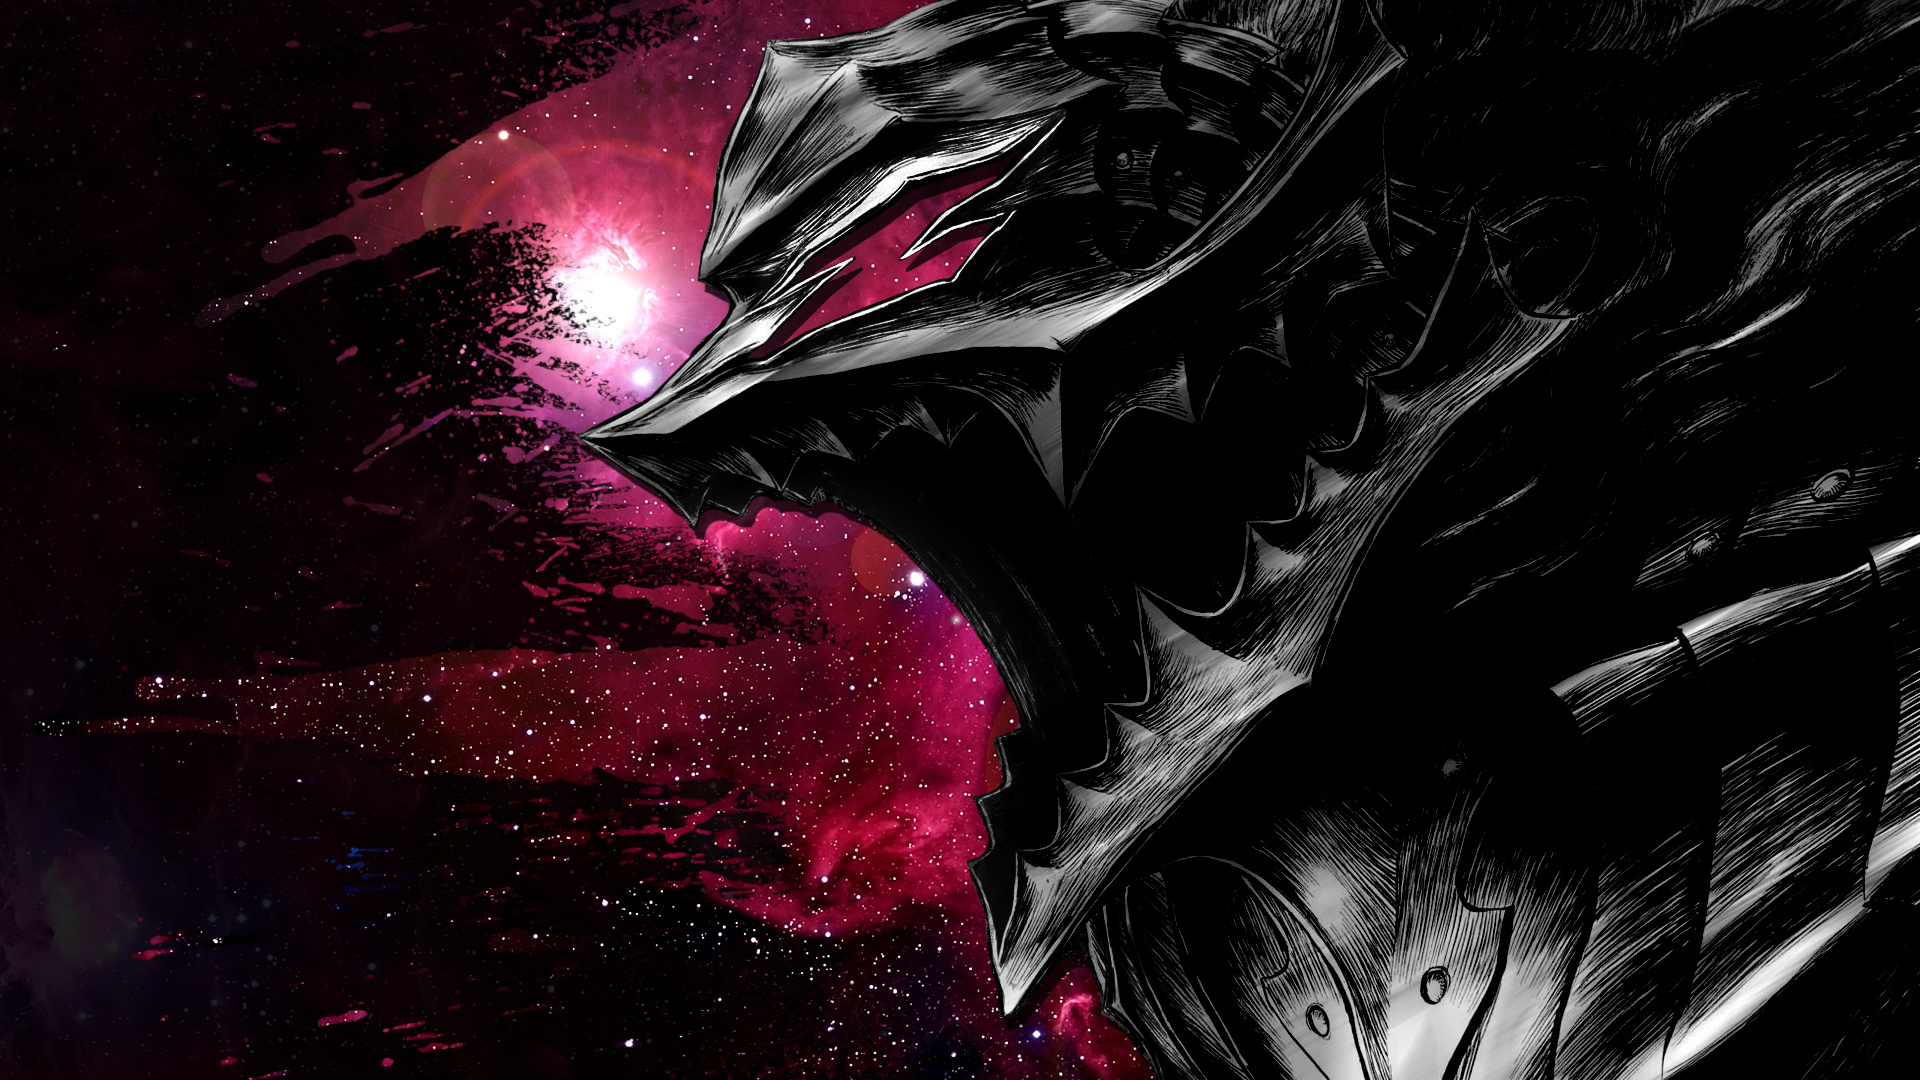 Anime Berserk Armor Wallpaper wweo Manga watercolor